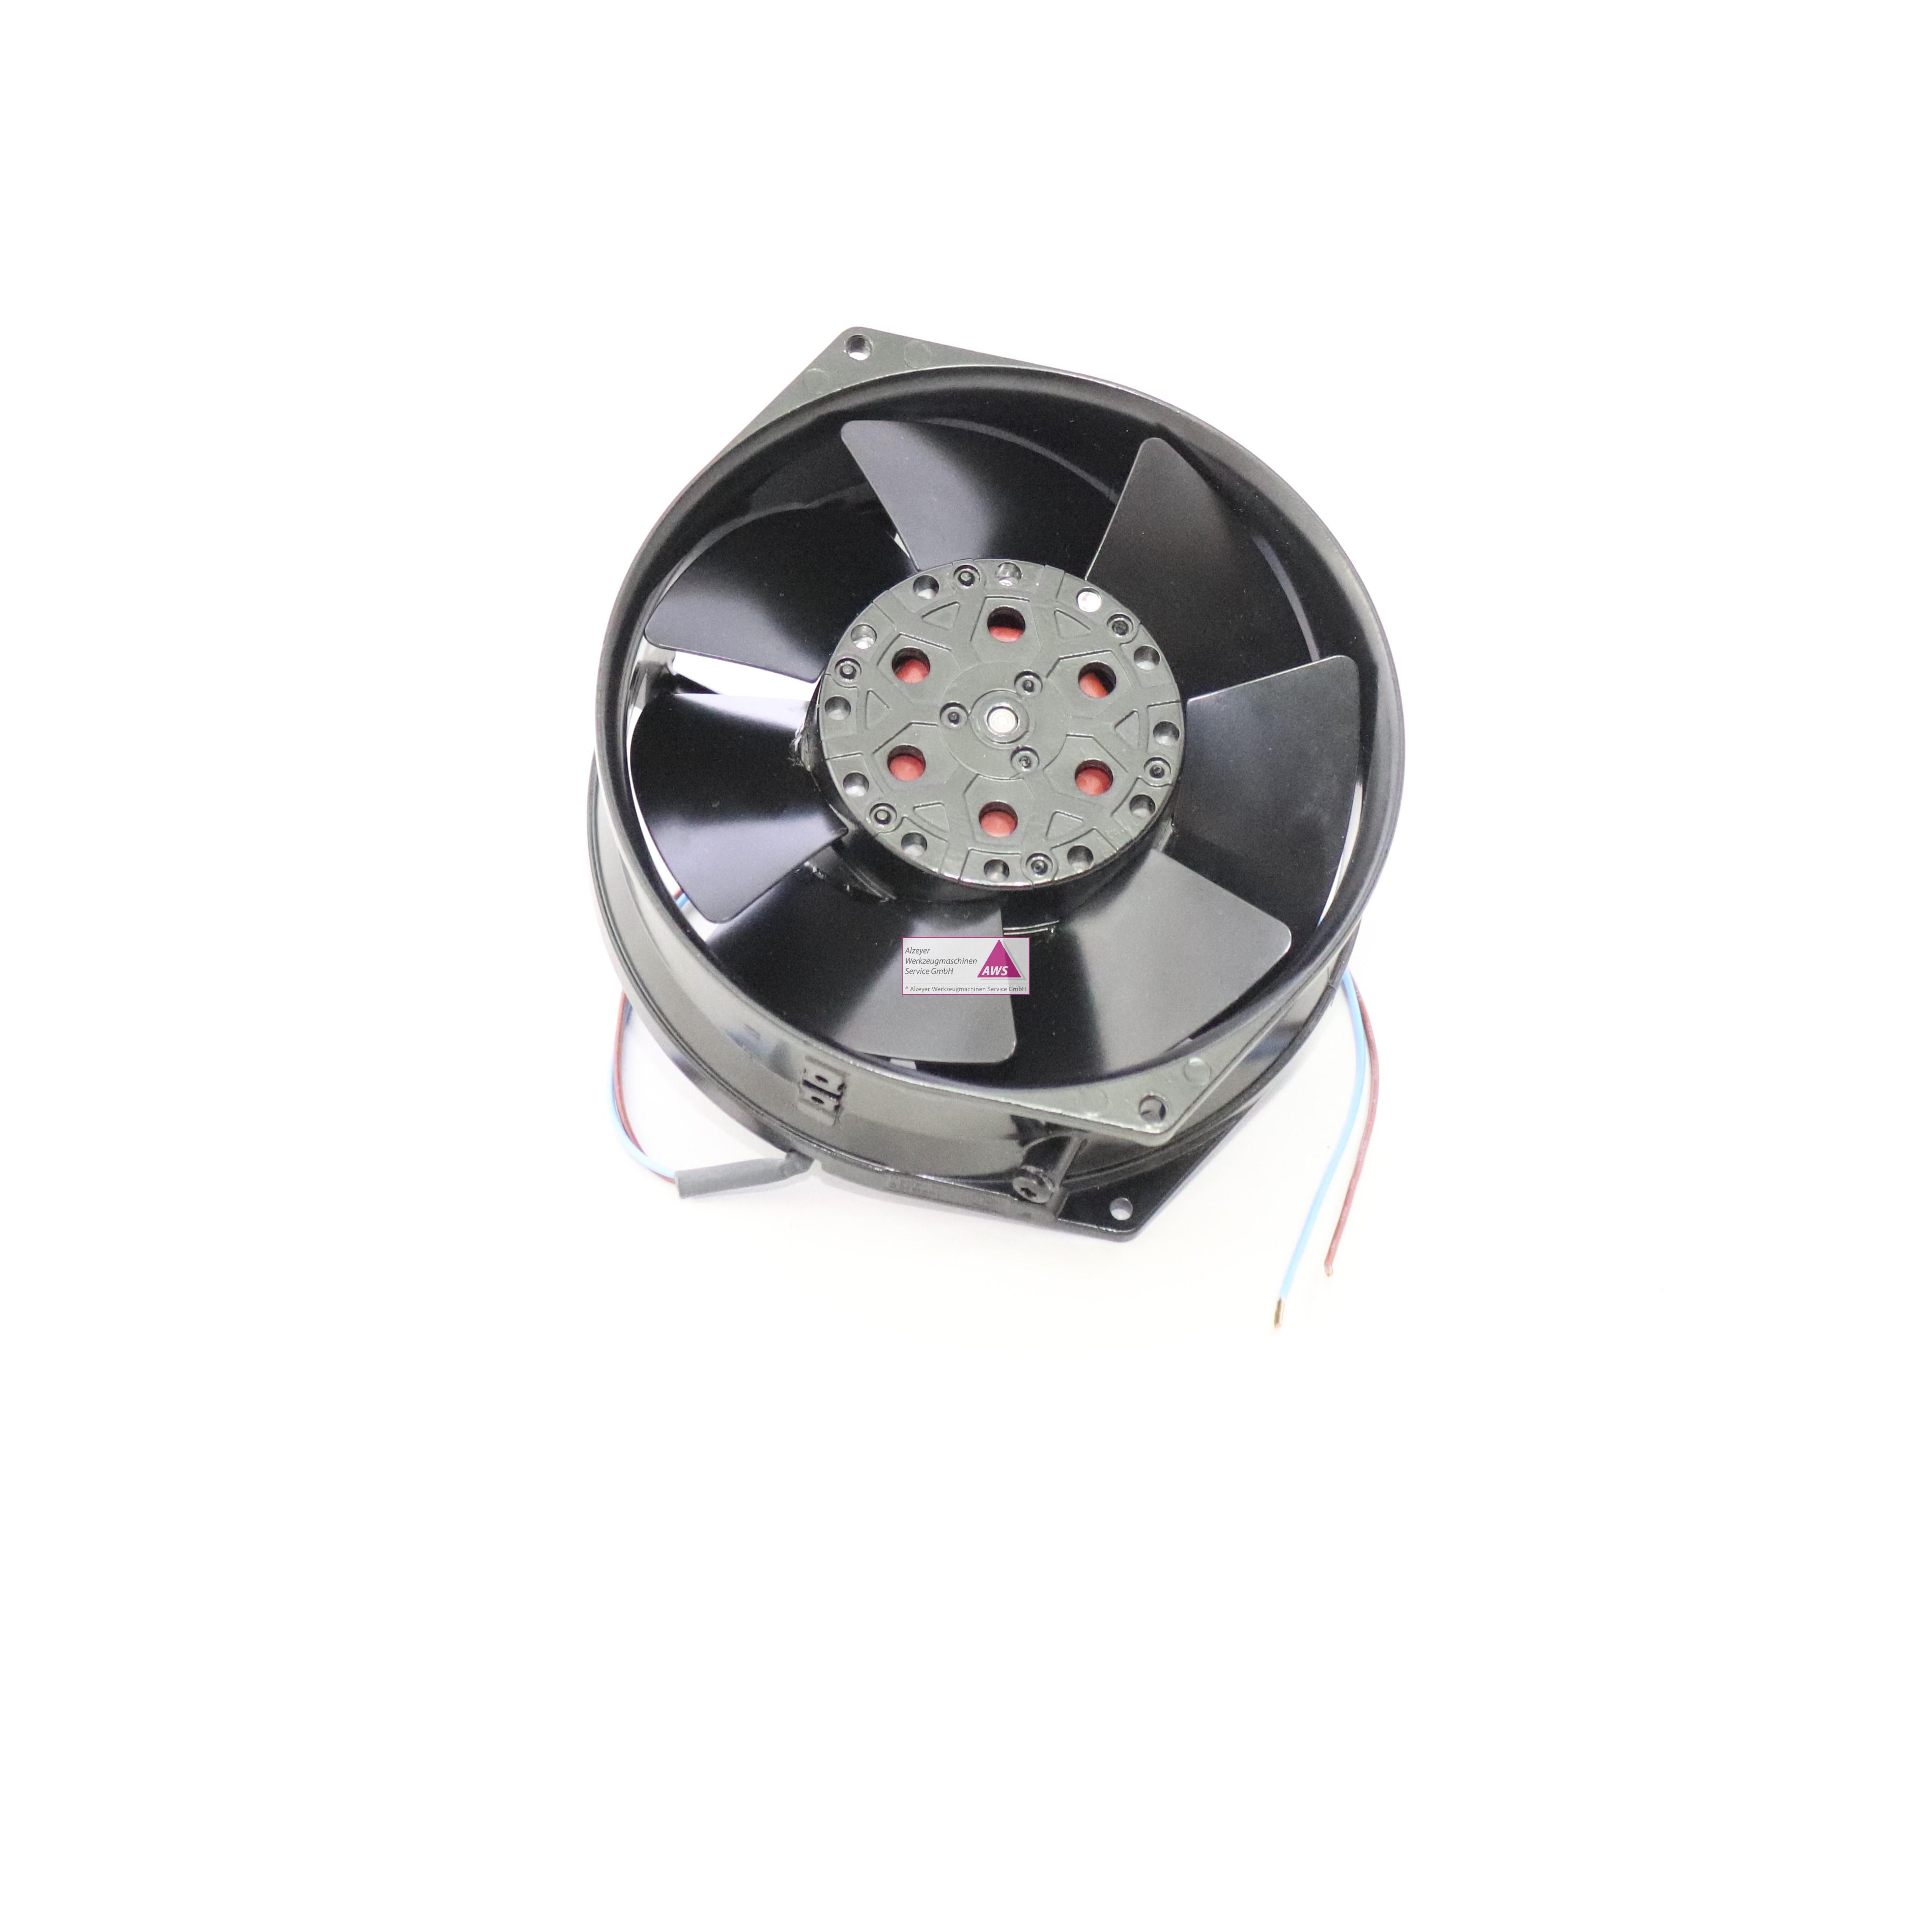 Ventilator Rund Ø150x55mm dick (115VAC)